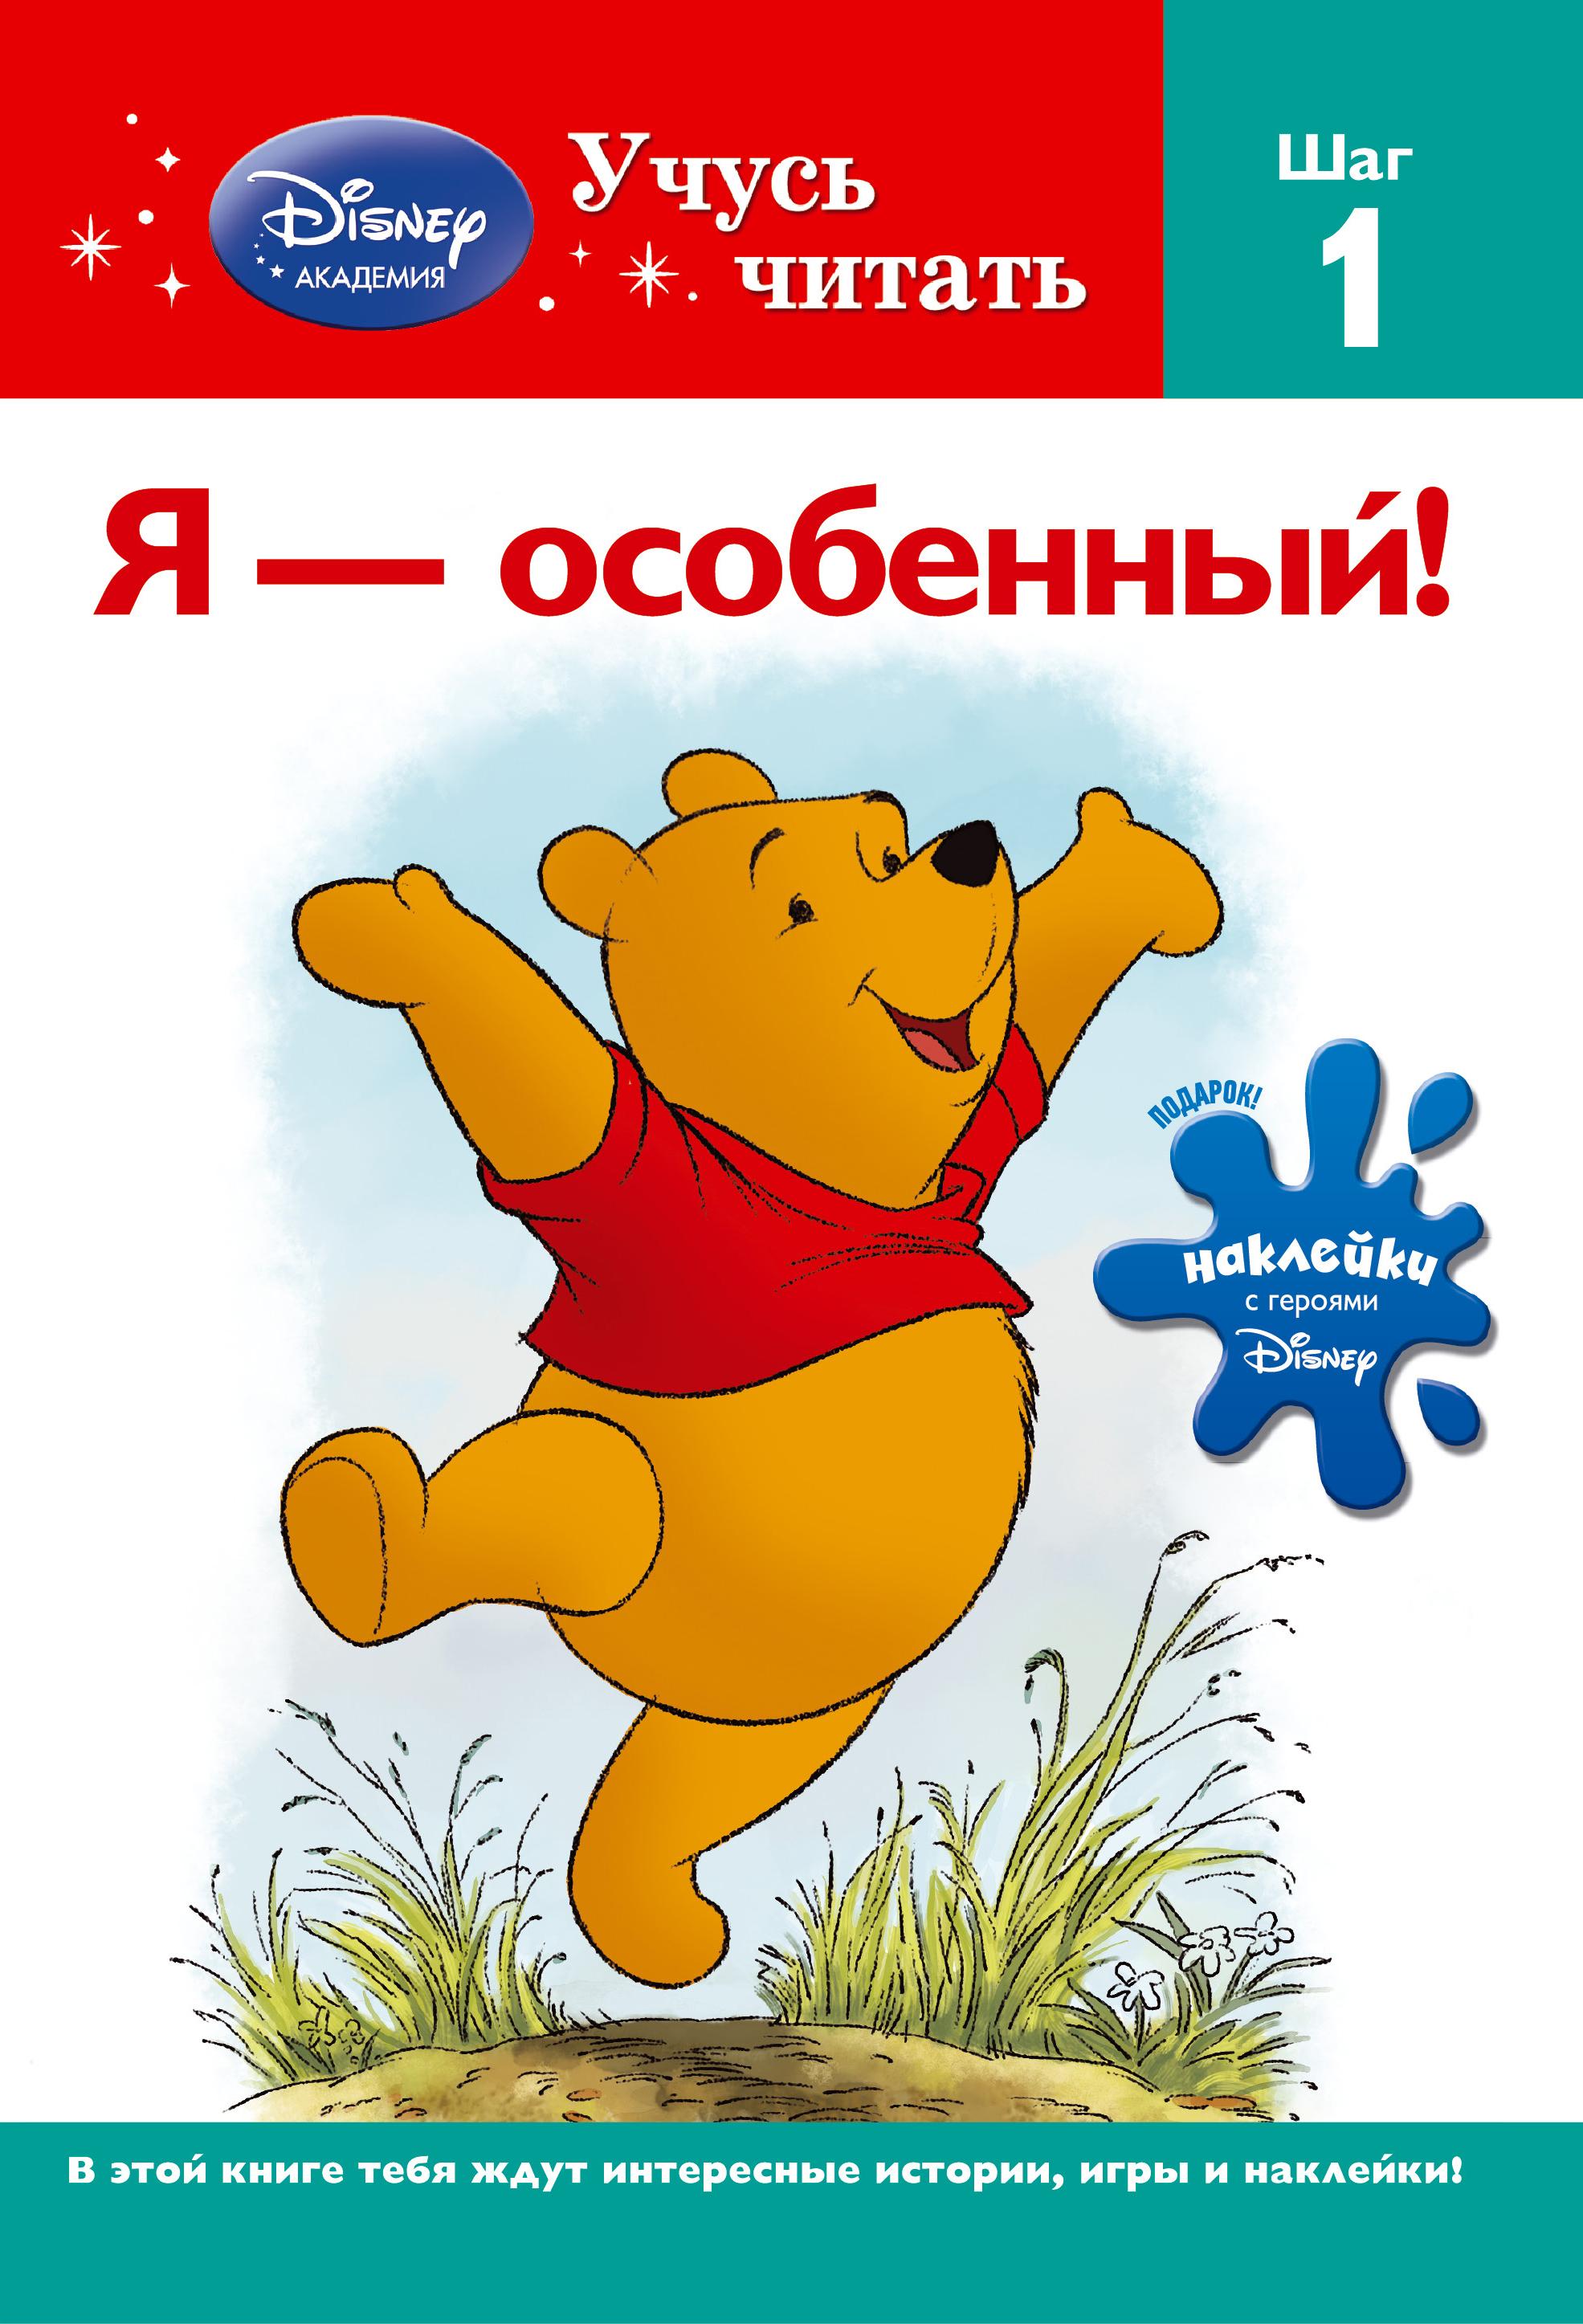 Я - особенный! Шаг 1 (Winnie the Pooh)